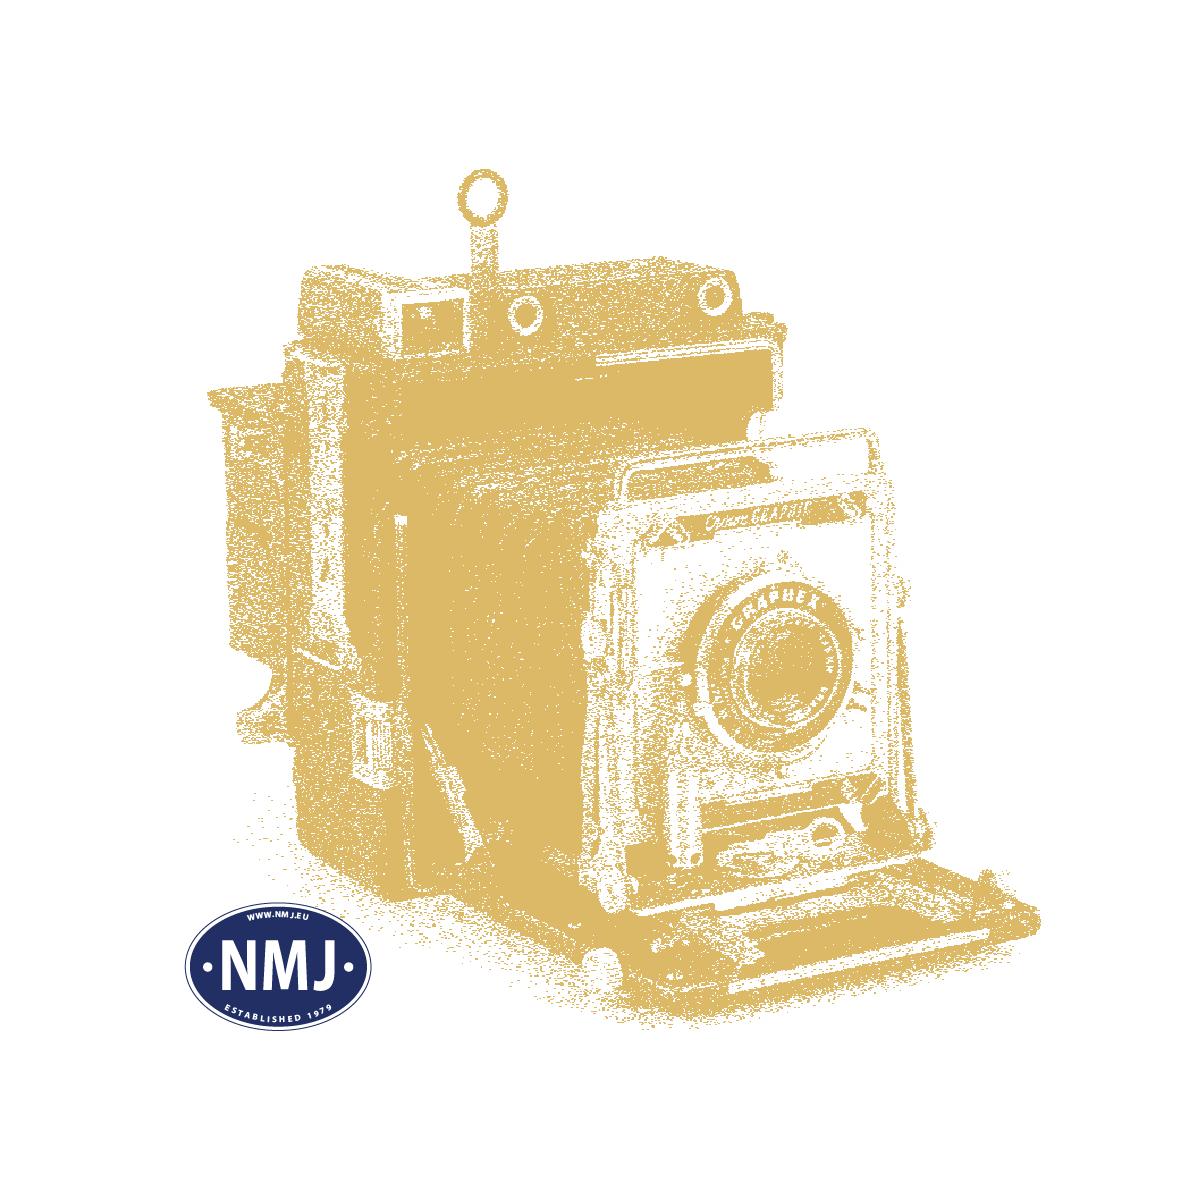 NMJ Topline CargoNet SKD224.213, Rød/gul, DCC Digital